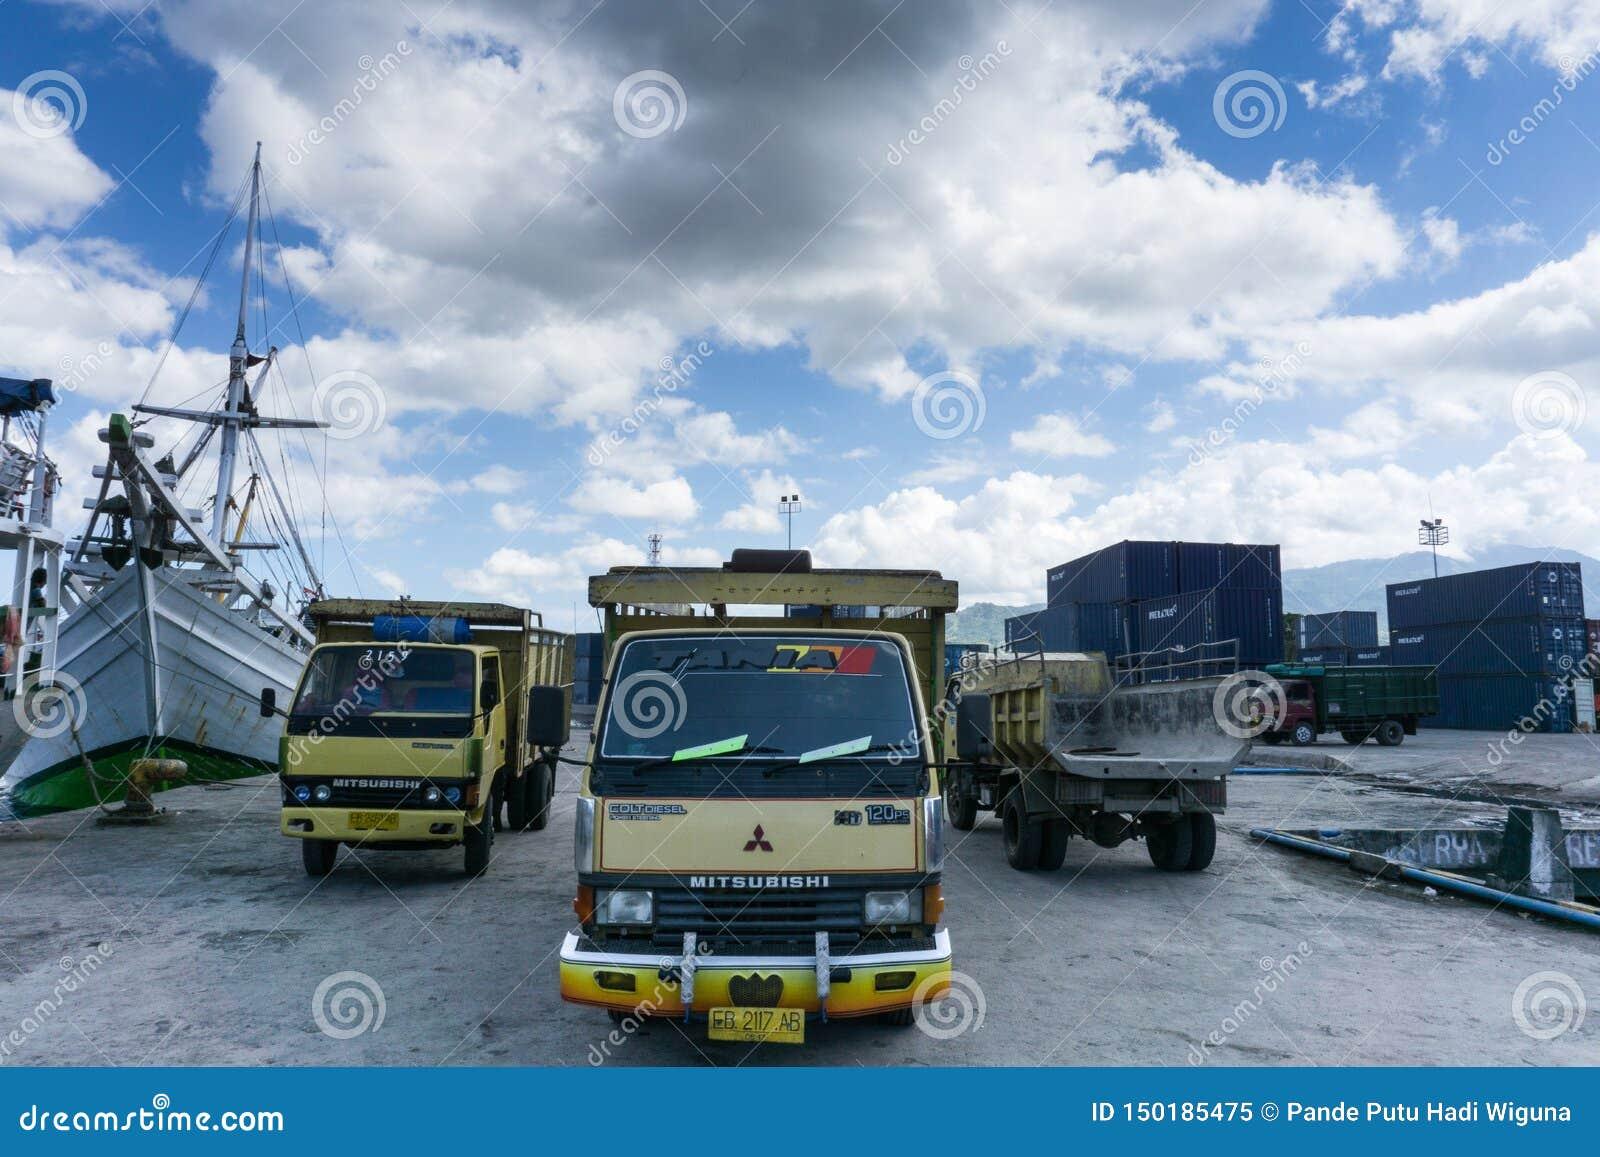 MAUMERE/INDONESIA- 28 ΑΠΡΙΛΊΟΥ 2014: Τρία φορτηγά που μεταφέρουν εμπορεύματα στάθμευσαν στο λιμένα Maumere μια σαφή ημέρα, που πε